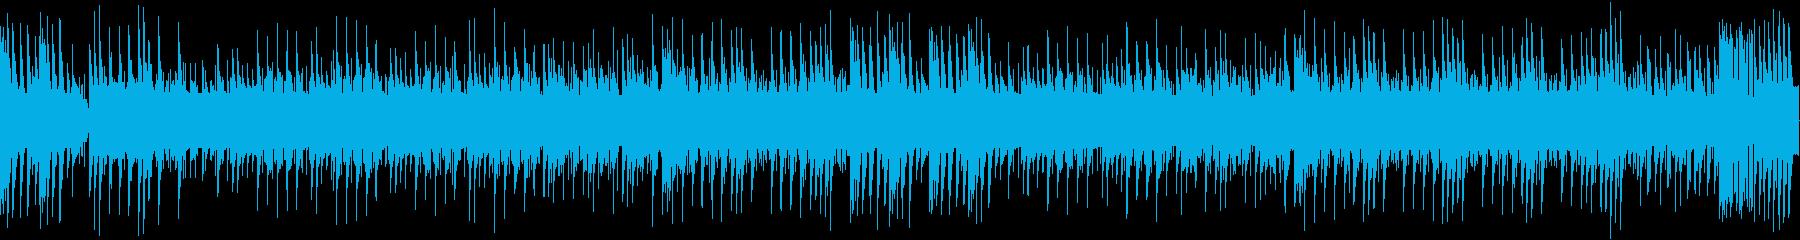 8bit ファンタジーなチップチューンの再生済みの波形